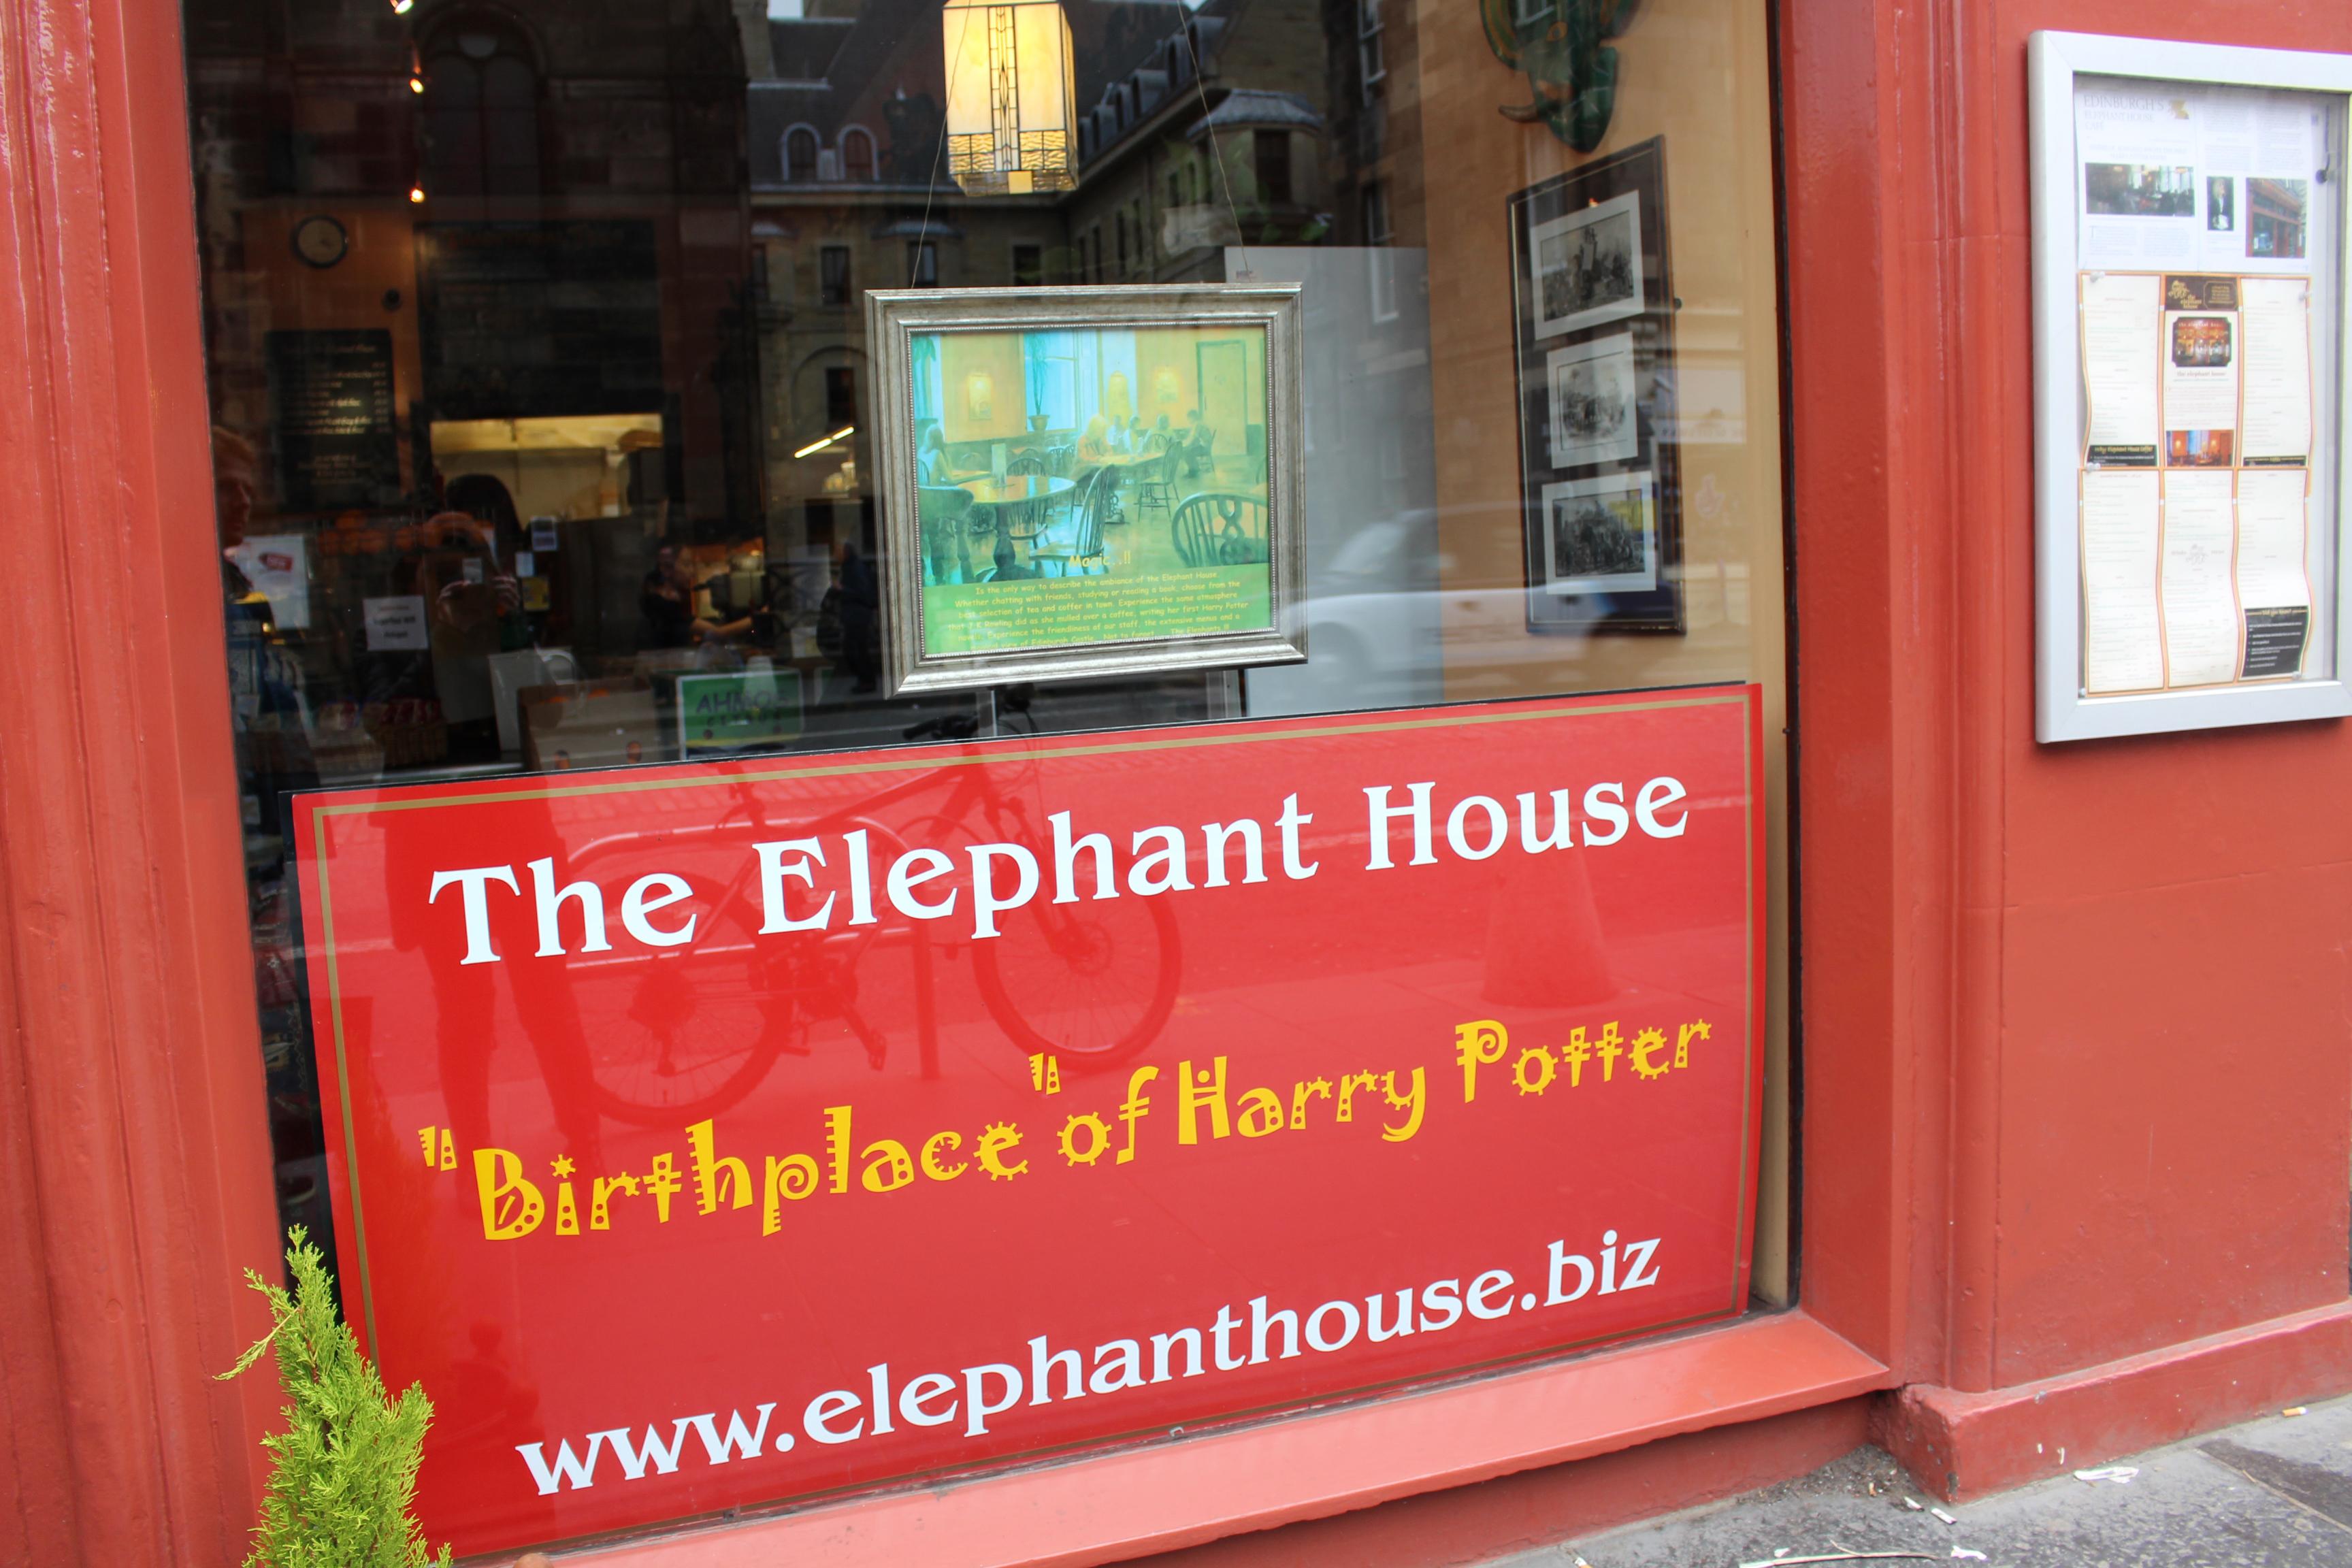 The Elephant House